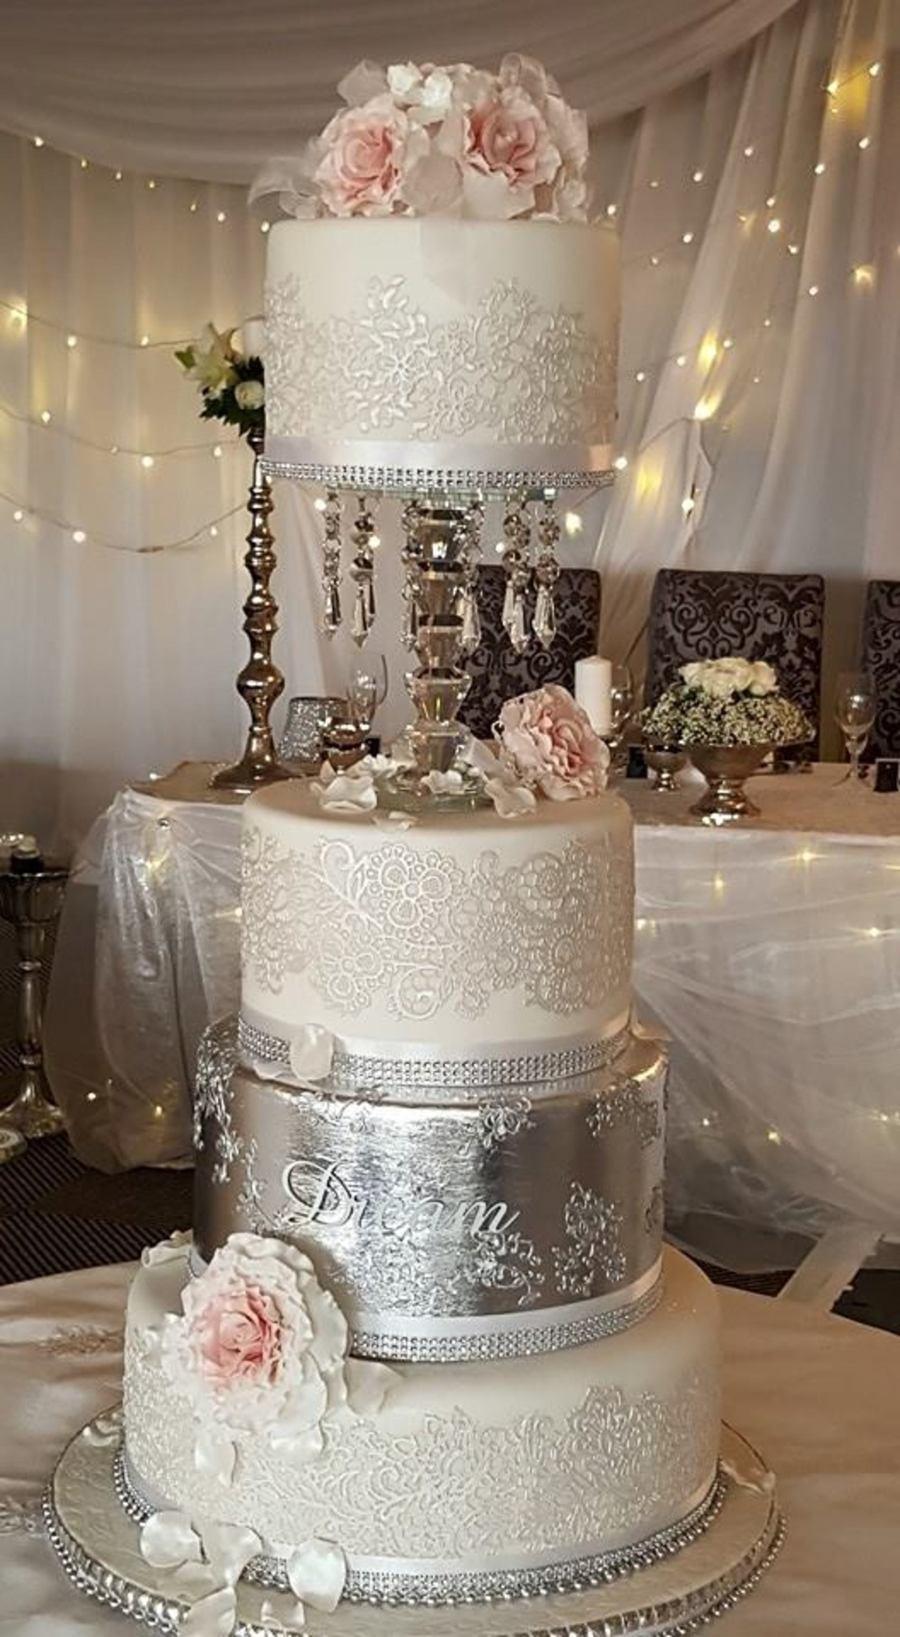 I Do Wedding Cakes  Wedding Cake Silver Dreams 2015 Cornelia Marreiros